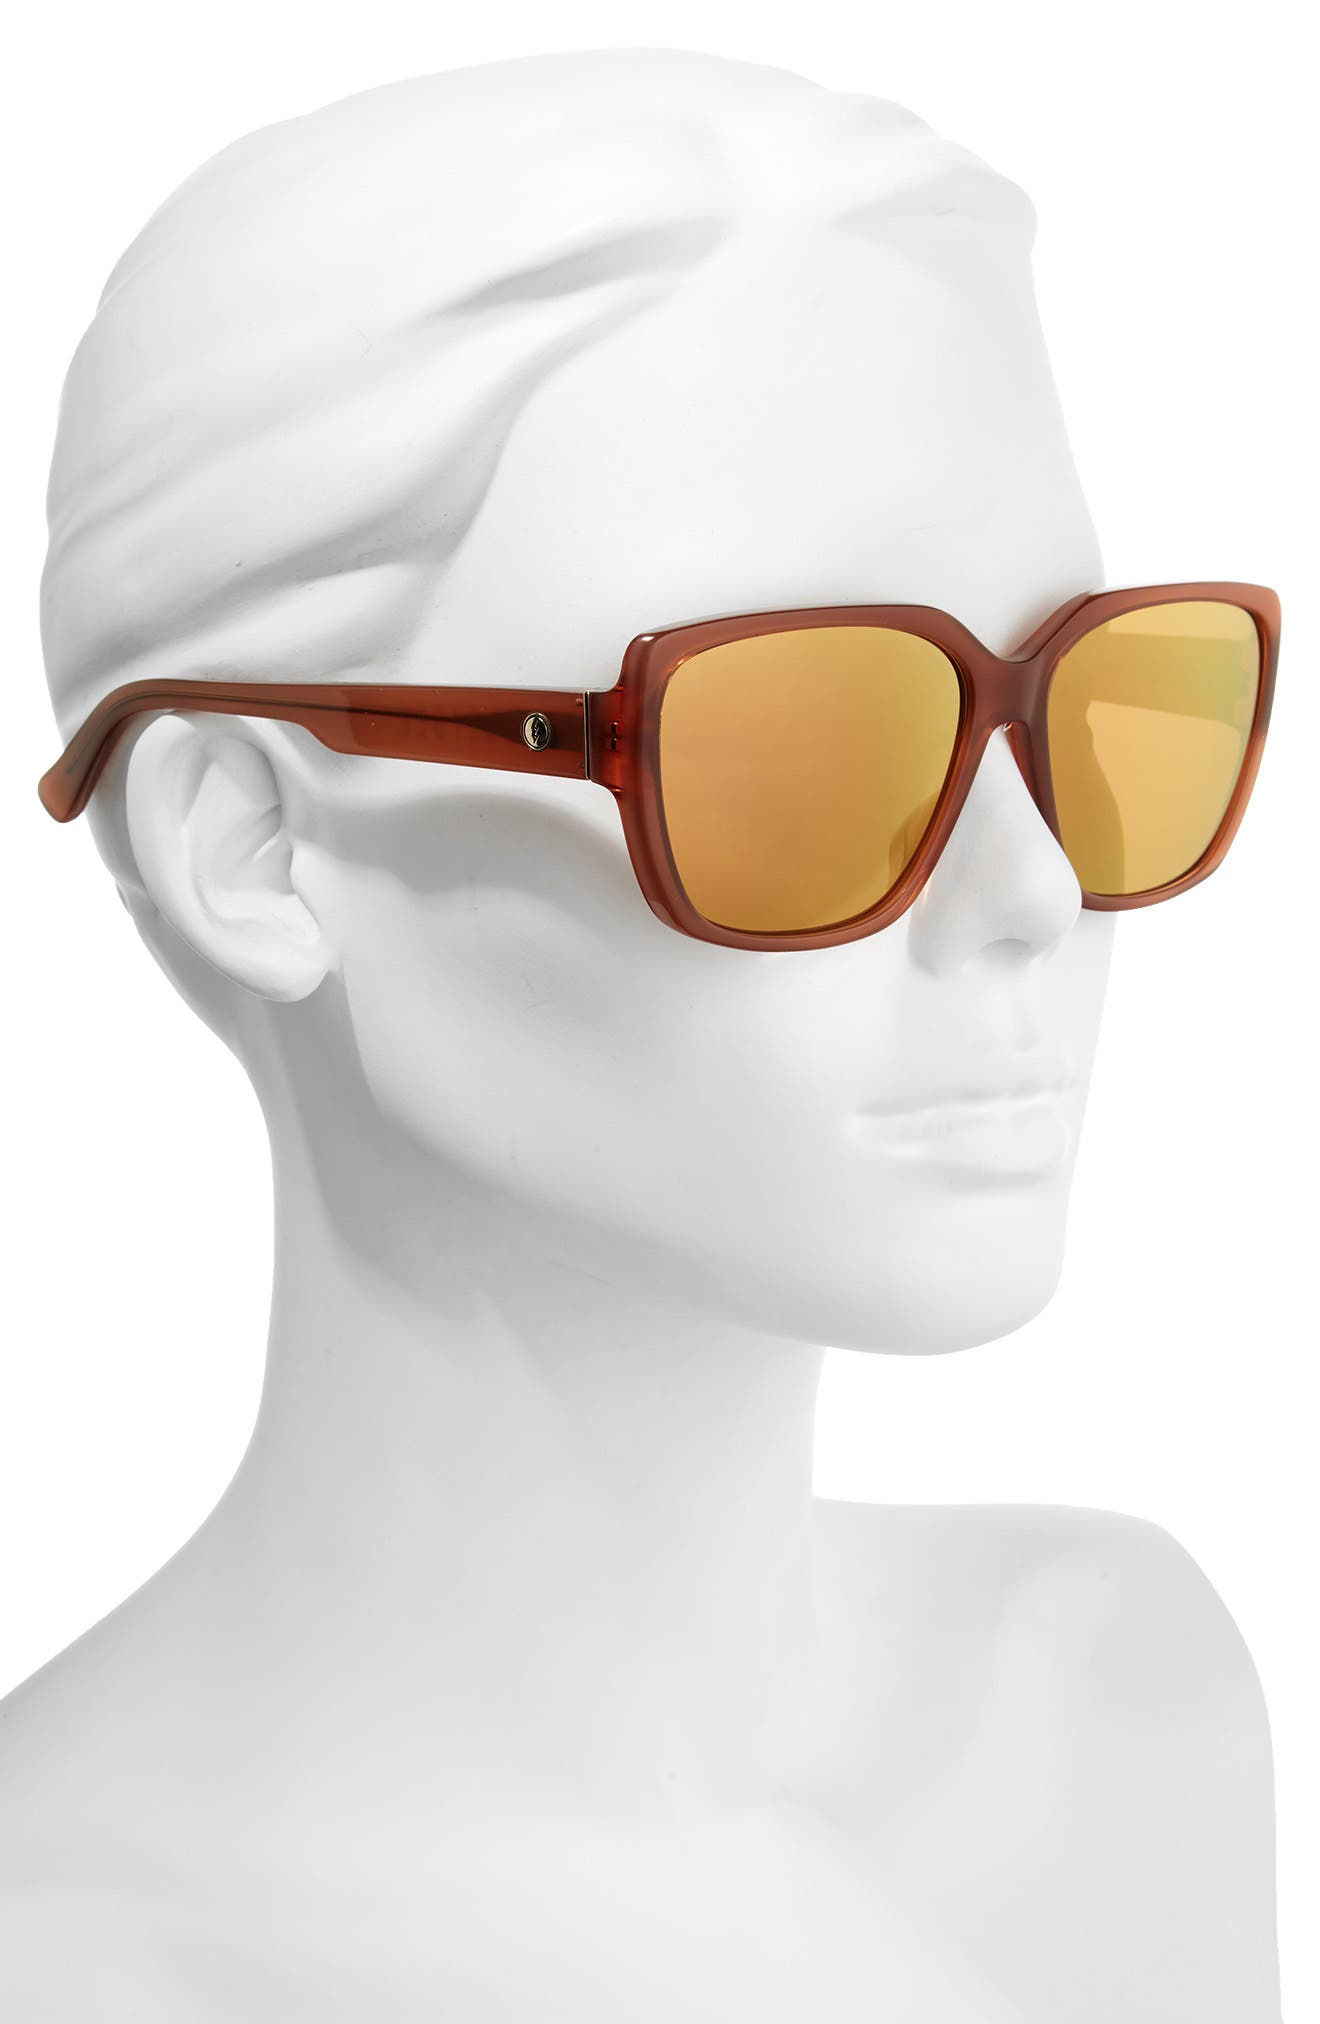 Honey Bee 60mm Mirrored Sunglasses,                             Alternate thumbnail 2, color,                             CALAFIA ROSE/ CHAMPAGNE